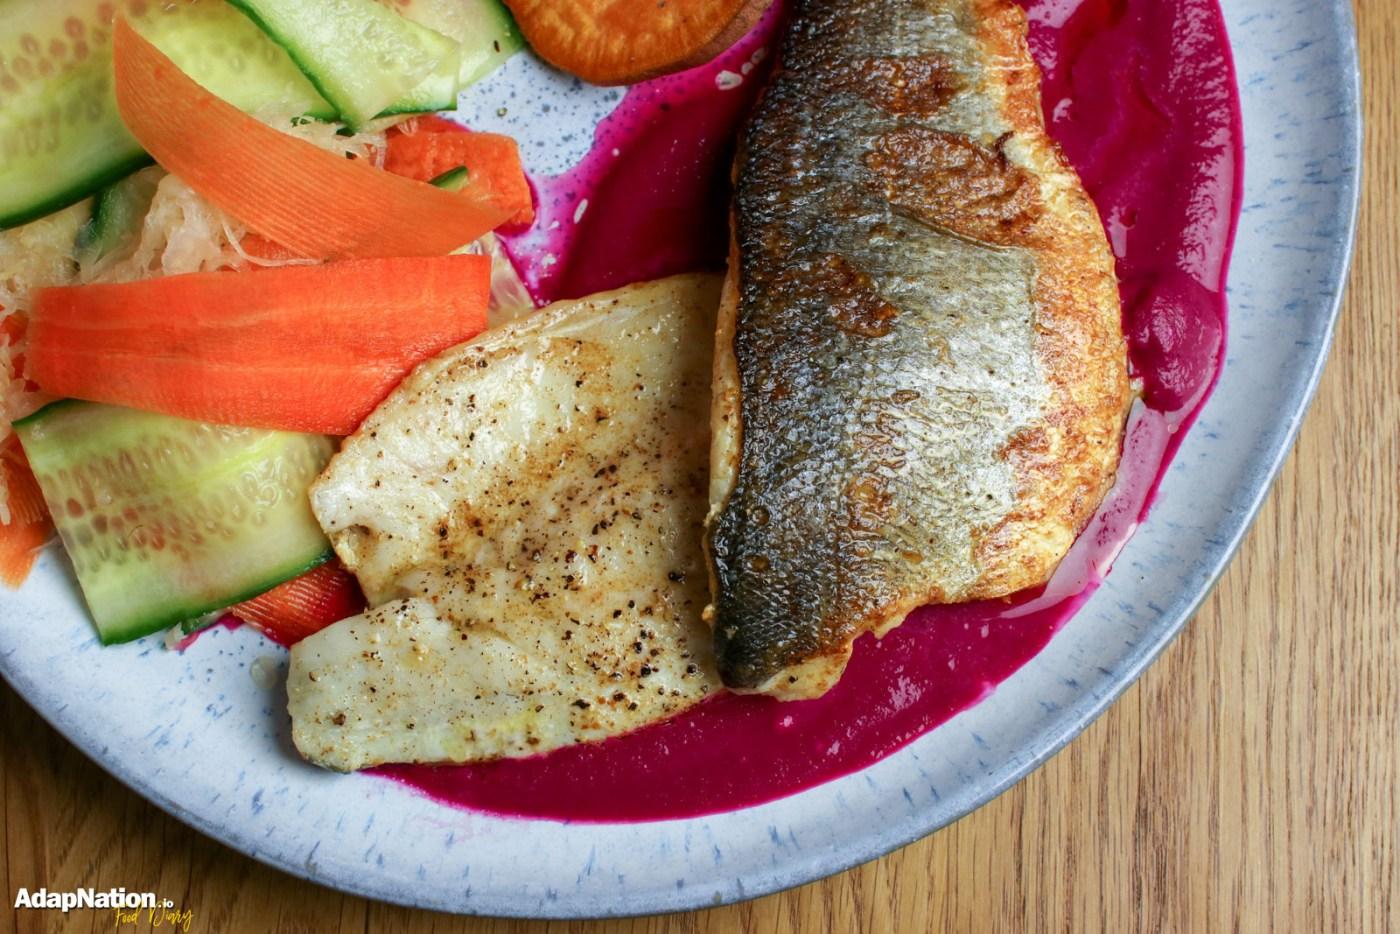 Pan Fried Sea Bass, Beetroot Purée, Sweet Potato Crisps & Pickled Veg